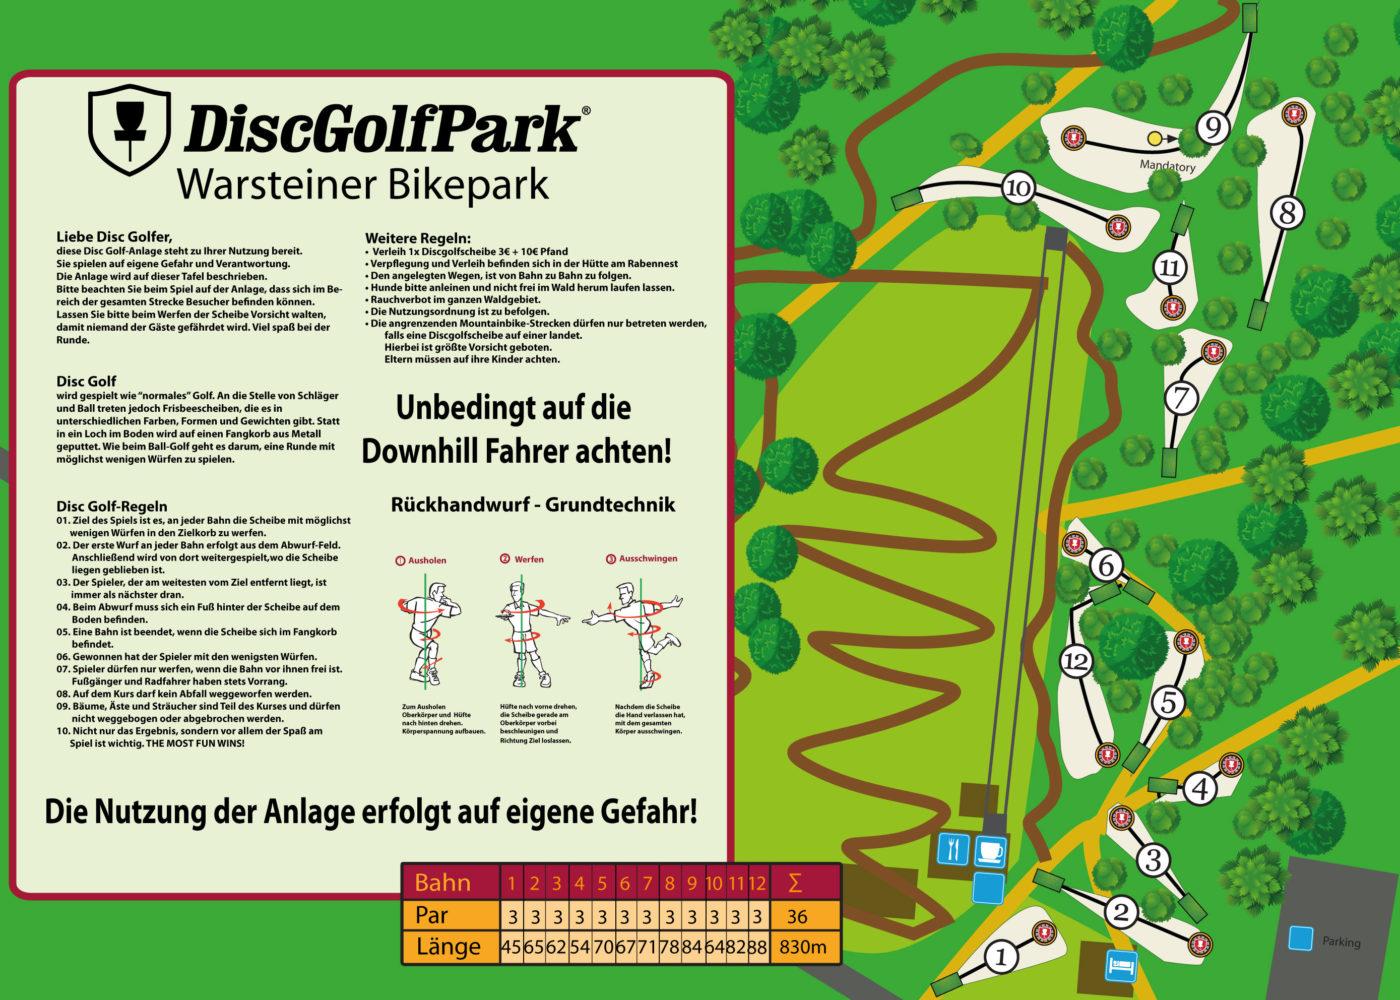 http://www.warsteiner-bikepark.de/wp-content/uploads/2017/03/discgolfmap-1400x1000.jpg